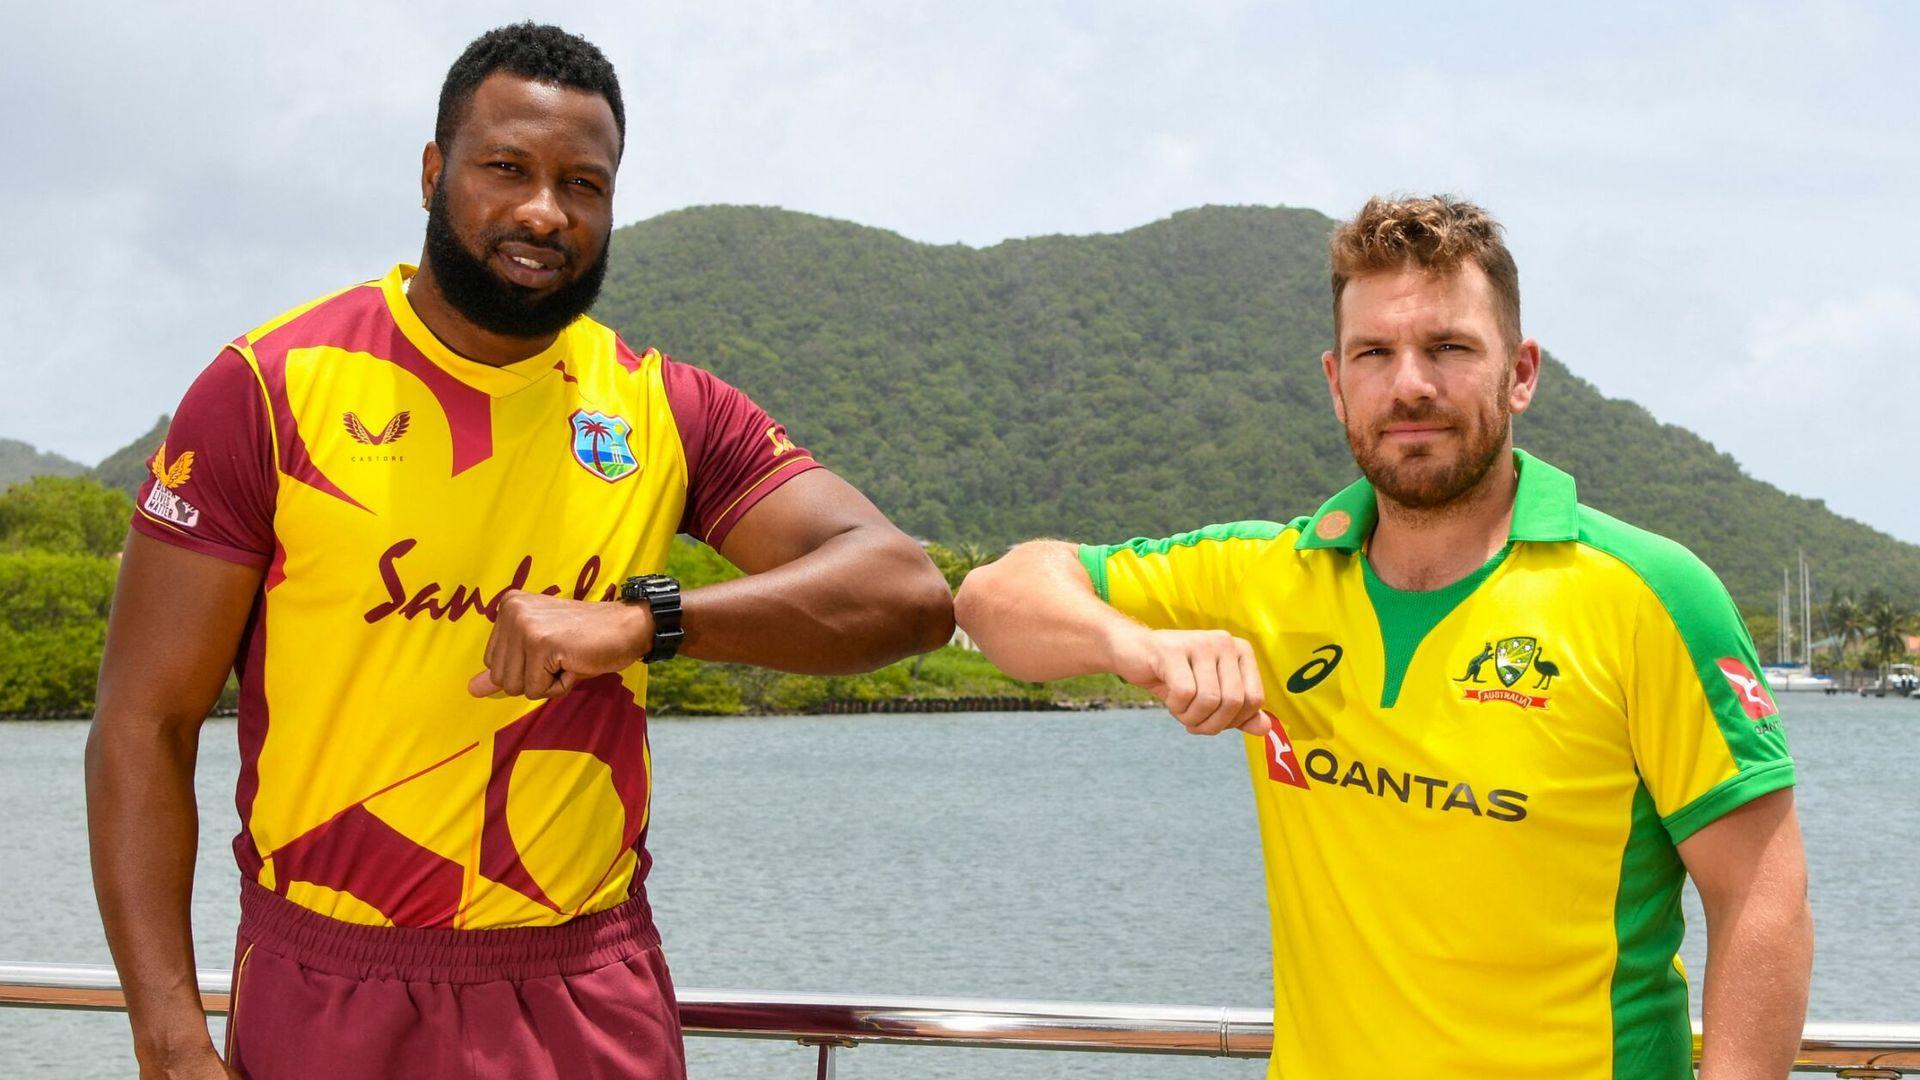 West Indies vs Australia ODI postponed after Covid case